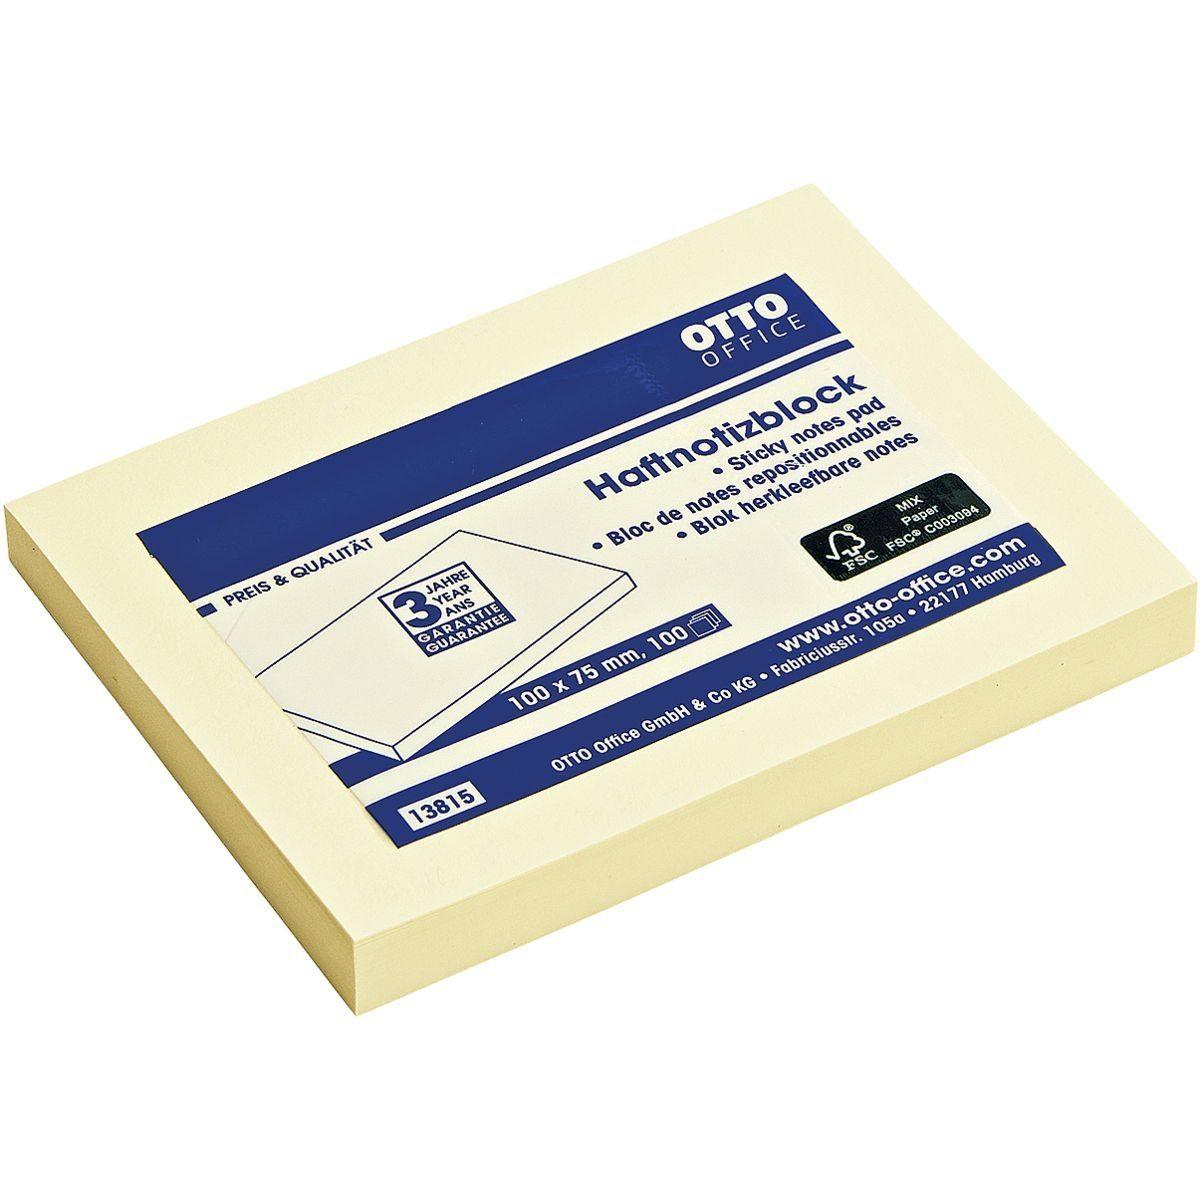 OTTO Office Standard Haftnotizblock 10,0 x 7,5 cm